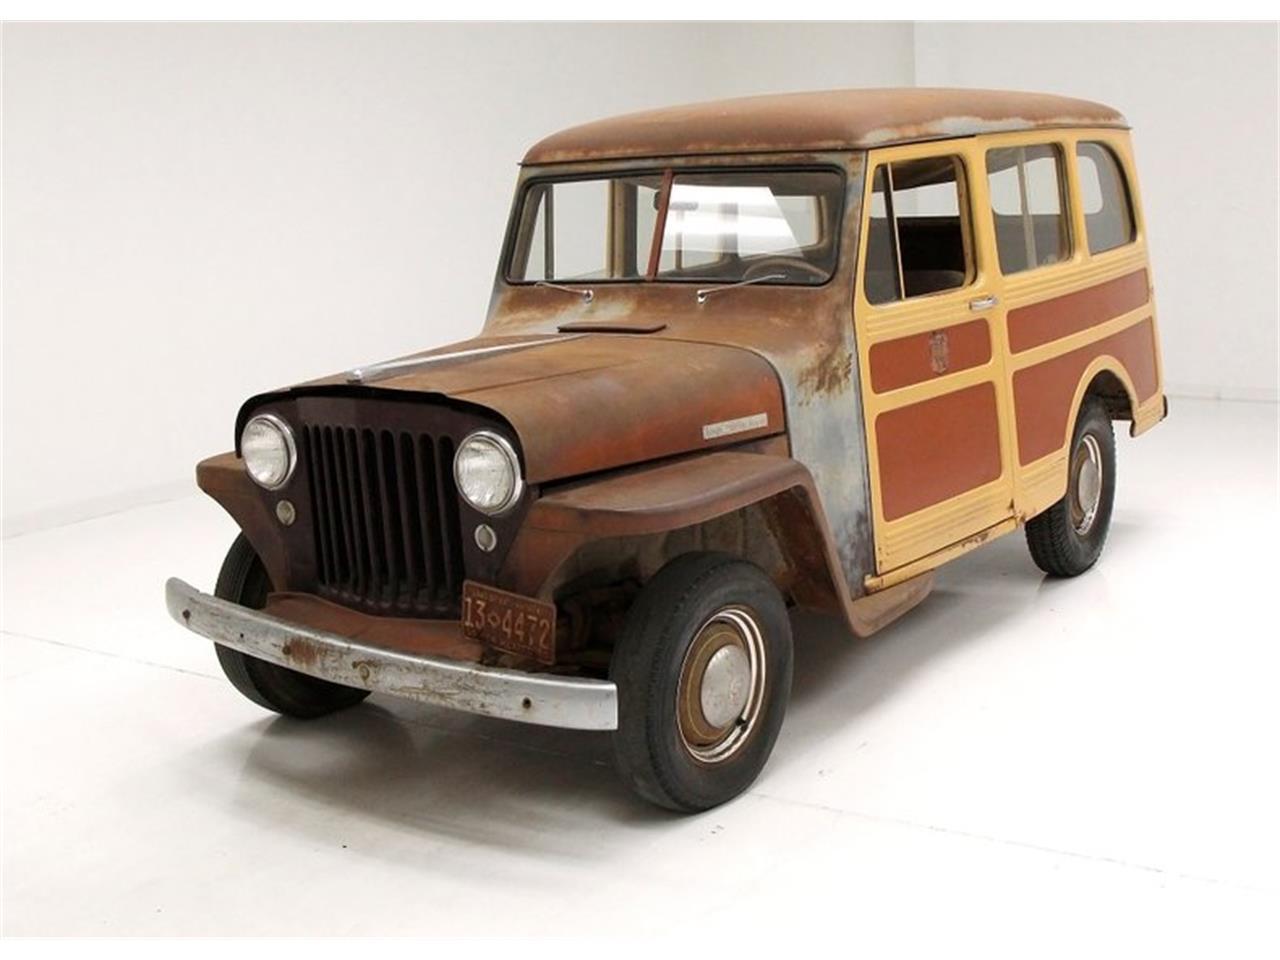 for sale 1947 jeep wagon in morgantown, pennsylvania cars - morgantown, pa at geebo